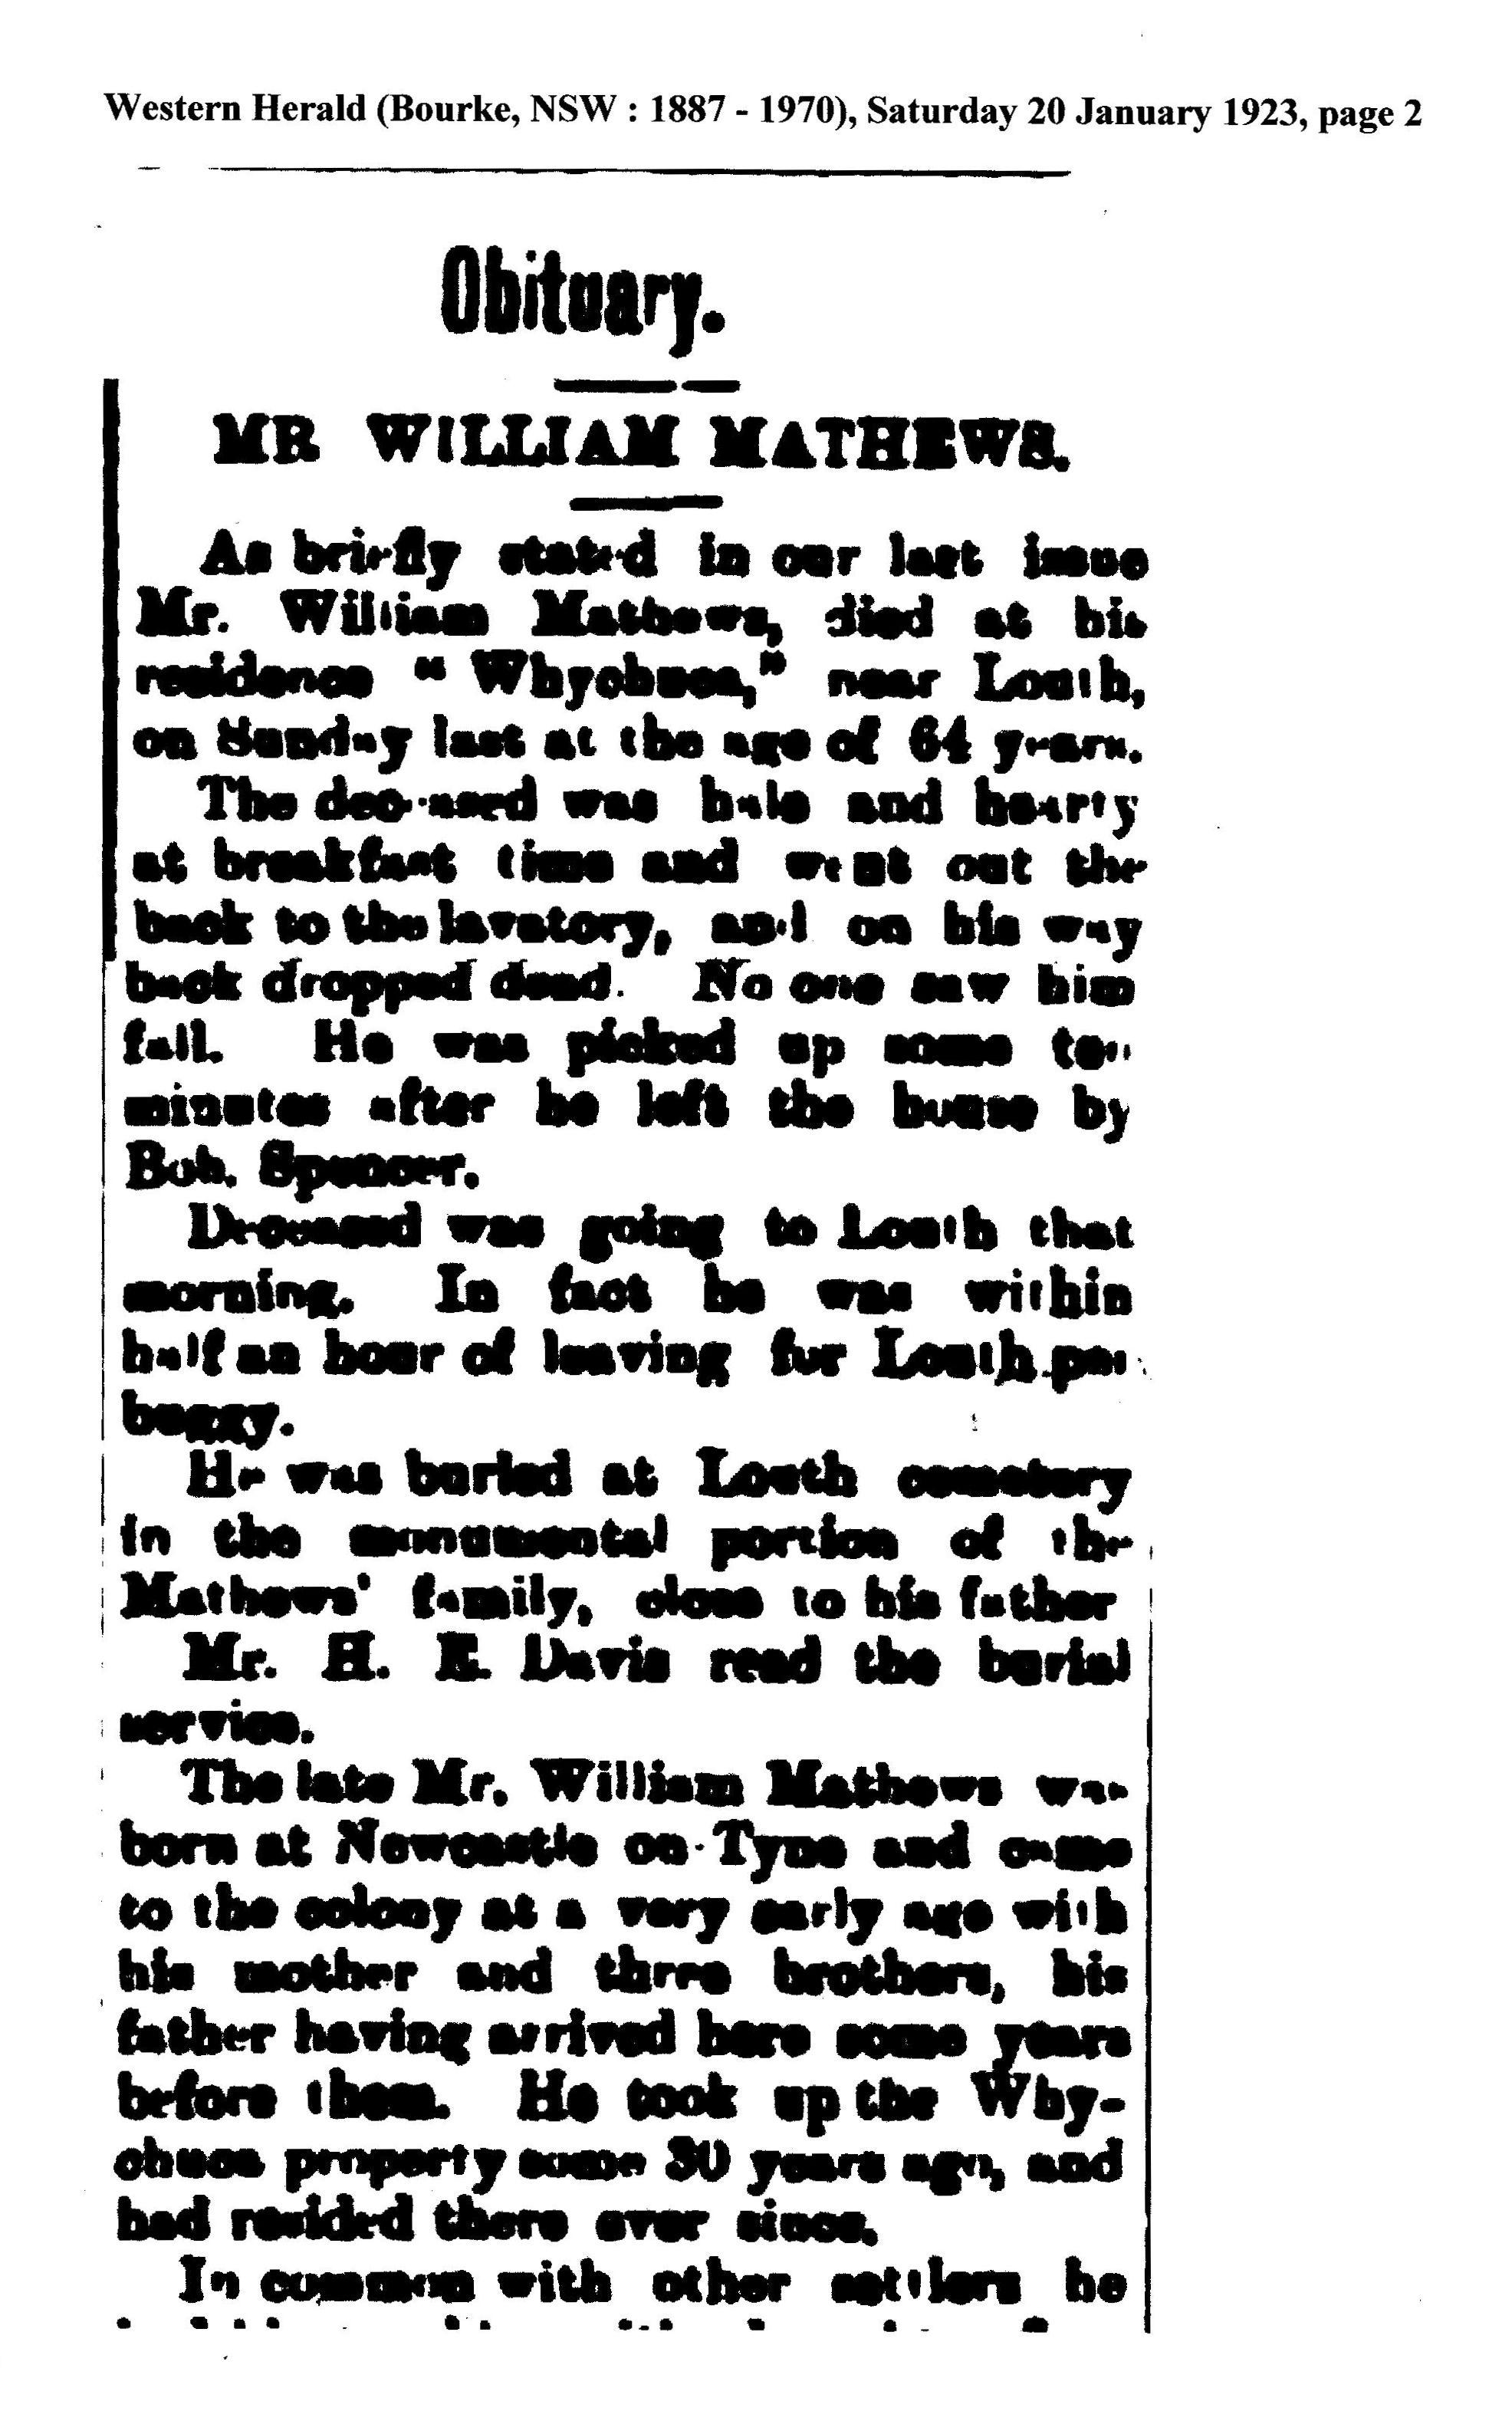 Death Will Mathews Louth, NSW. 1923, son Old T.A. Mathews